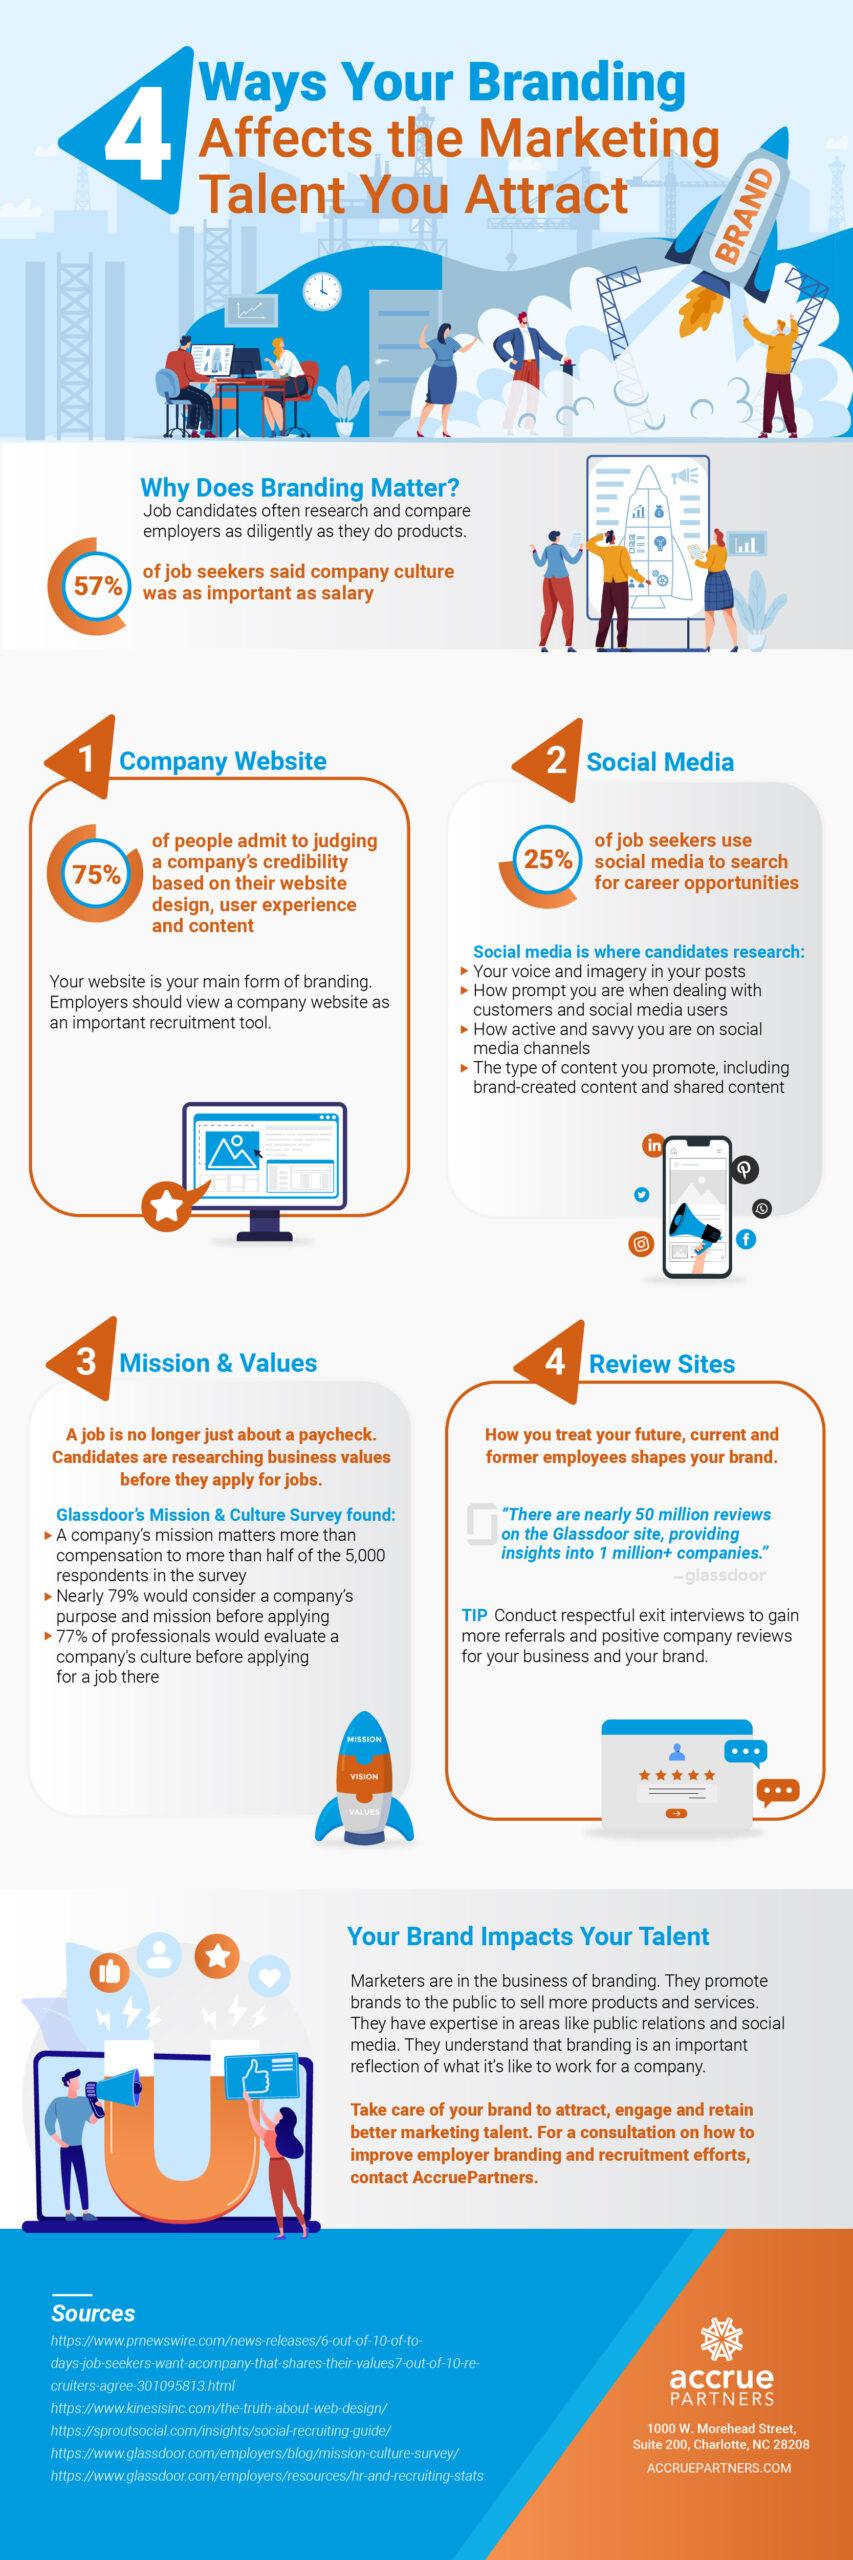 AccruePartners_WhyBrandingMatters_Infographics-01-01-01